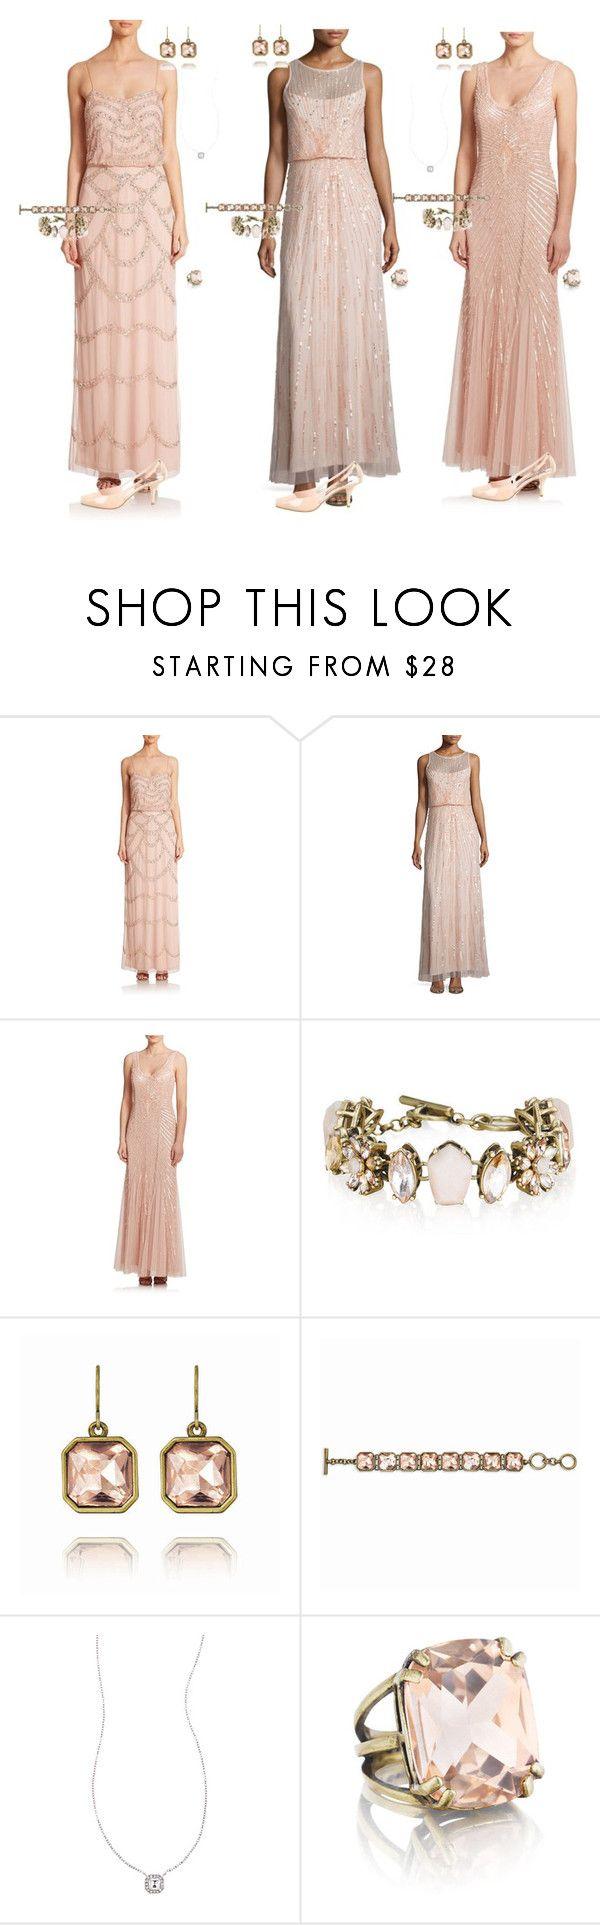 """Sparkle in Pink by Lexi Asha Personal Wedding Stylist"" by lexi-asha ❤ liked on Polyvore featuring Aidan Mattox, Aidan Aidan Mattox, Chloe + Isabel and Giorgio Armani"